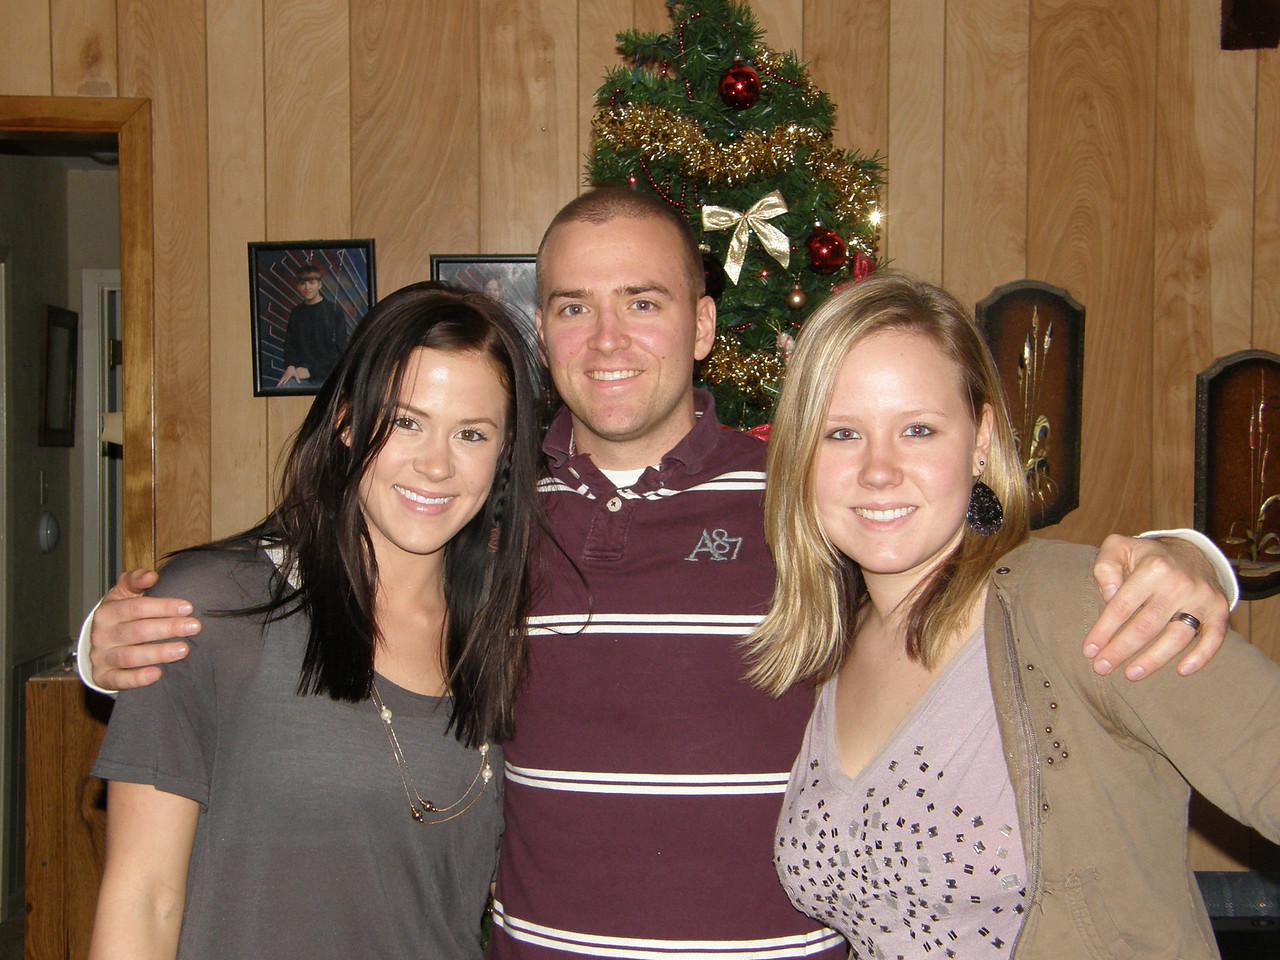 Brother and sisters!  Sarah Jane, Luke Van,  and Katie Brooke.